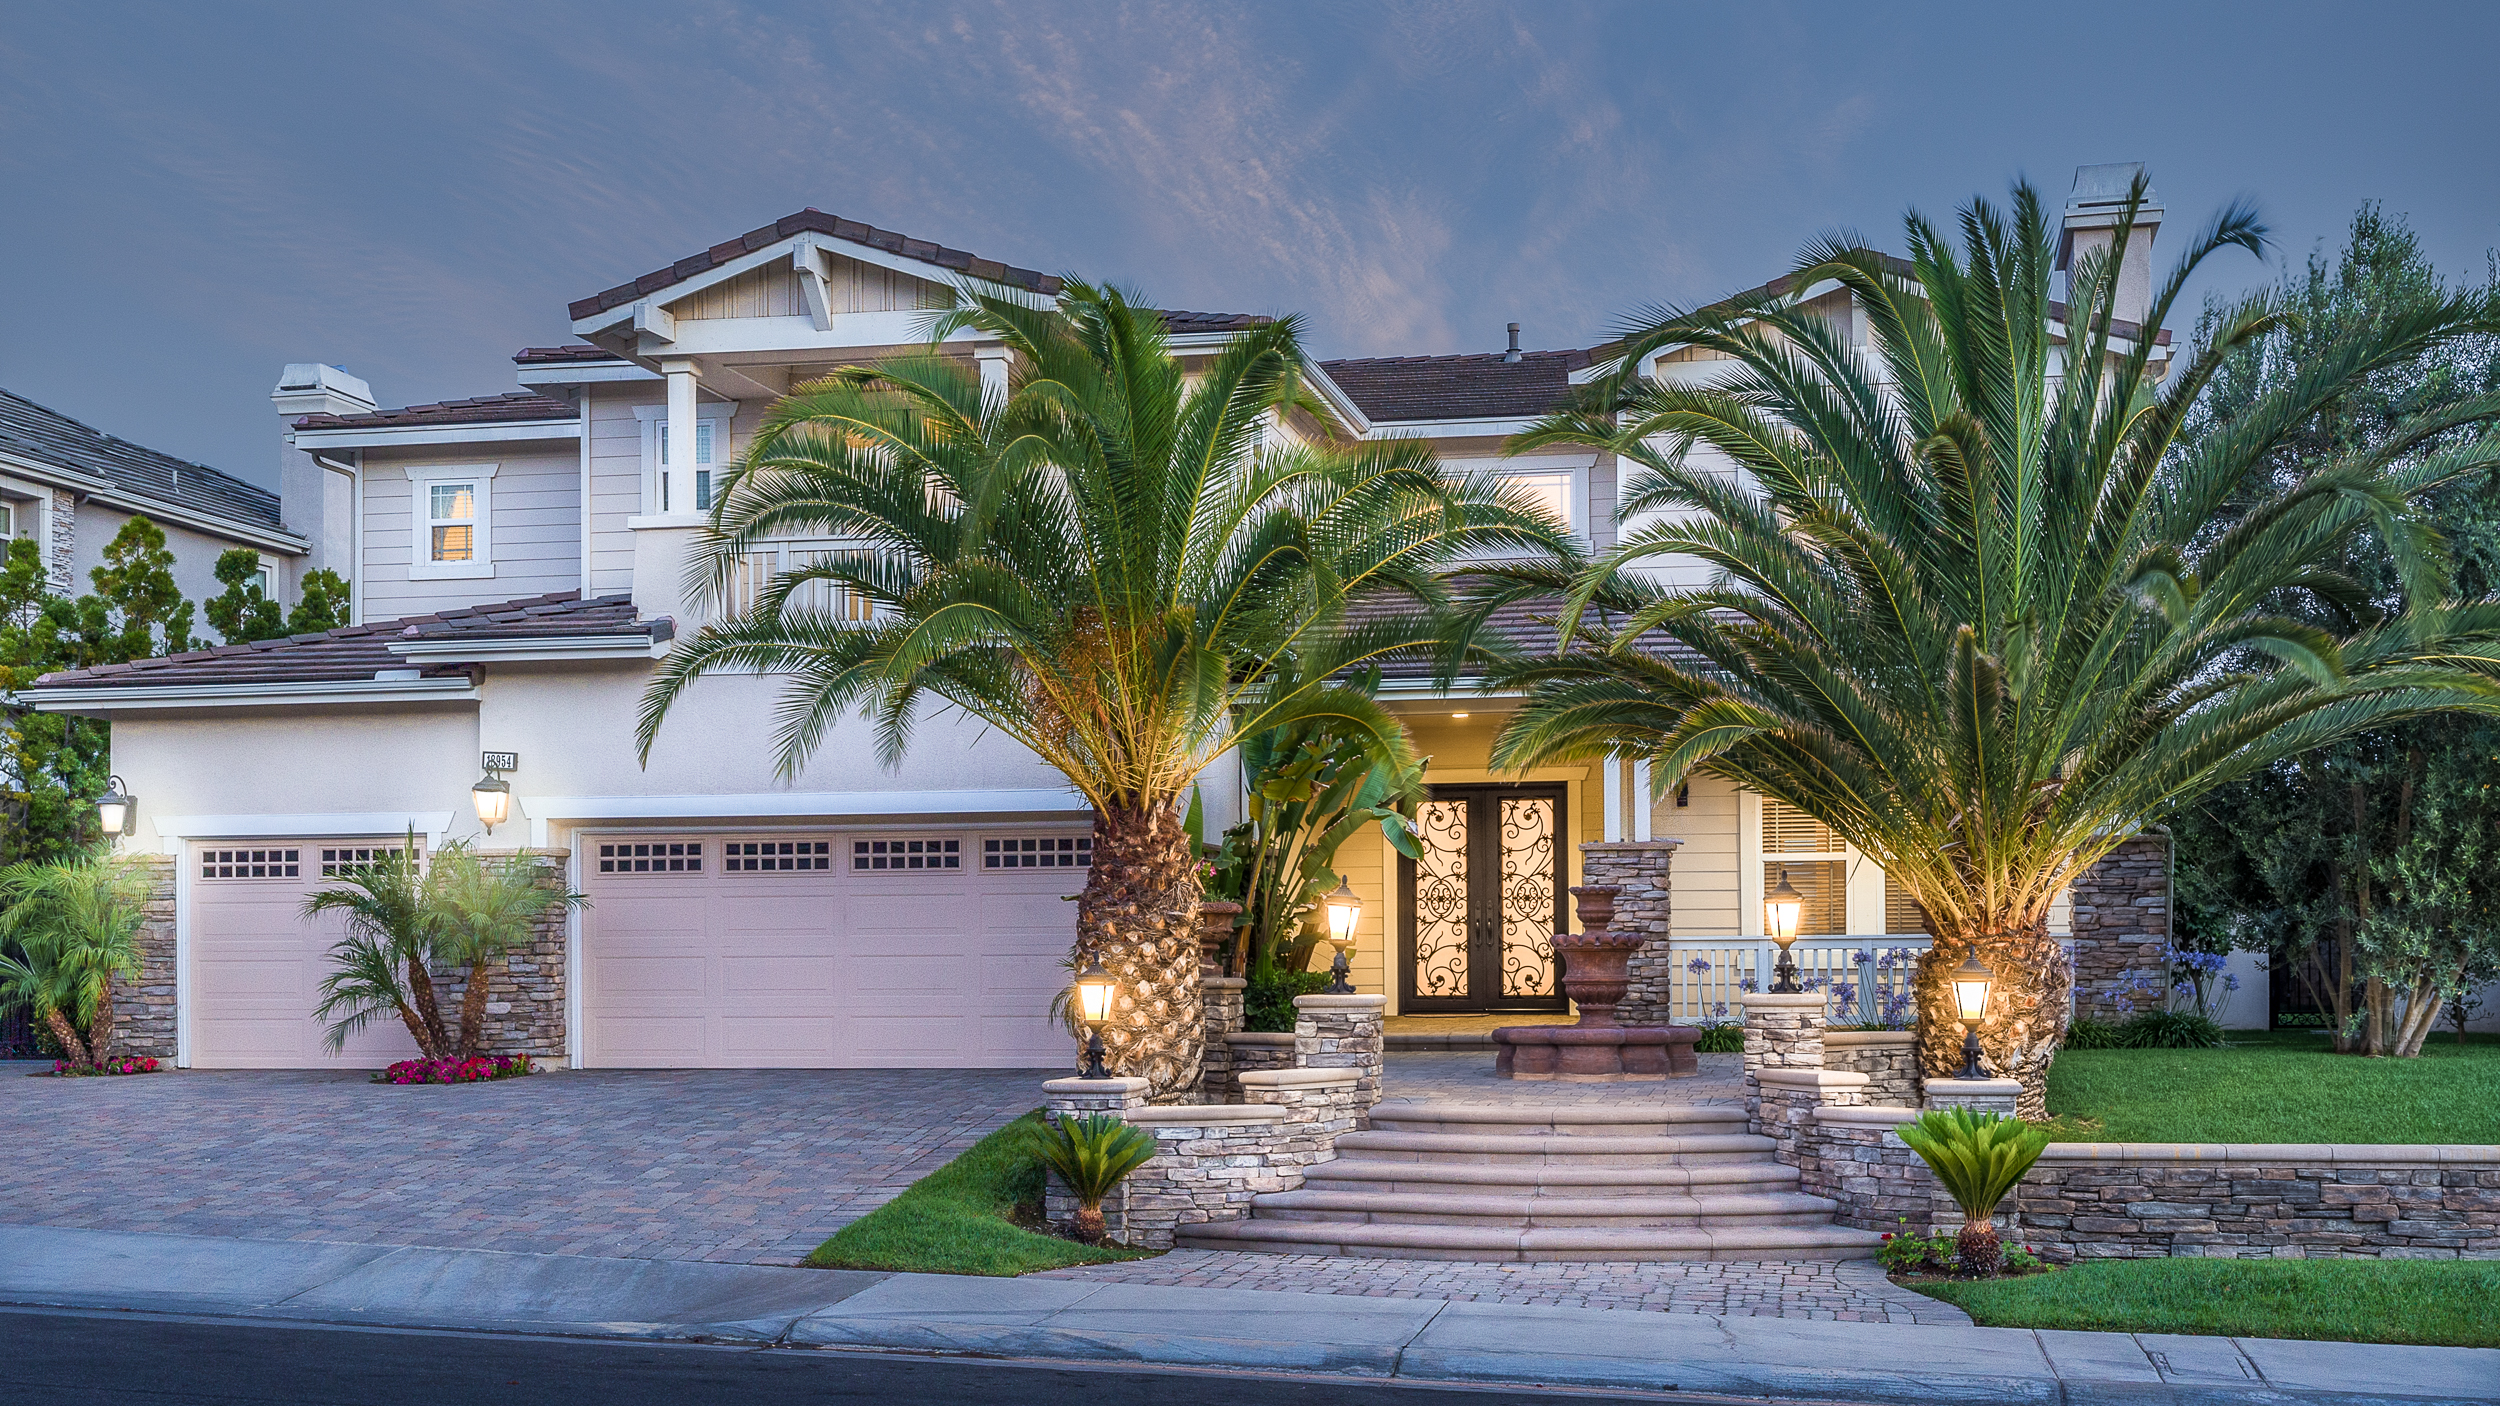 Yorba Linda Real Estate Photography Twilight Exterior Orange County